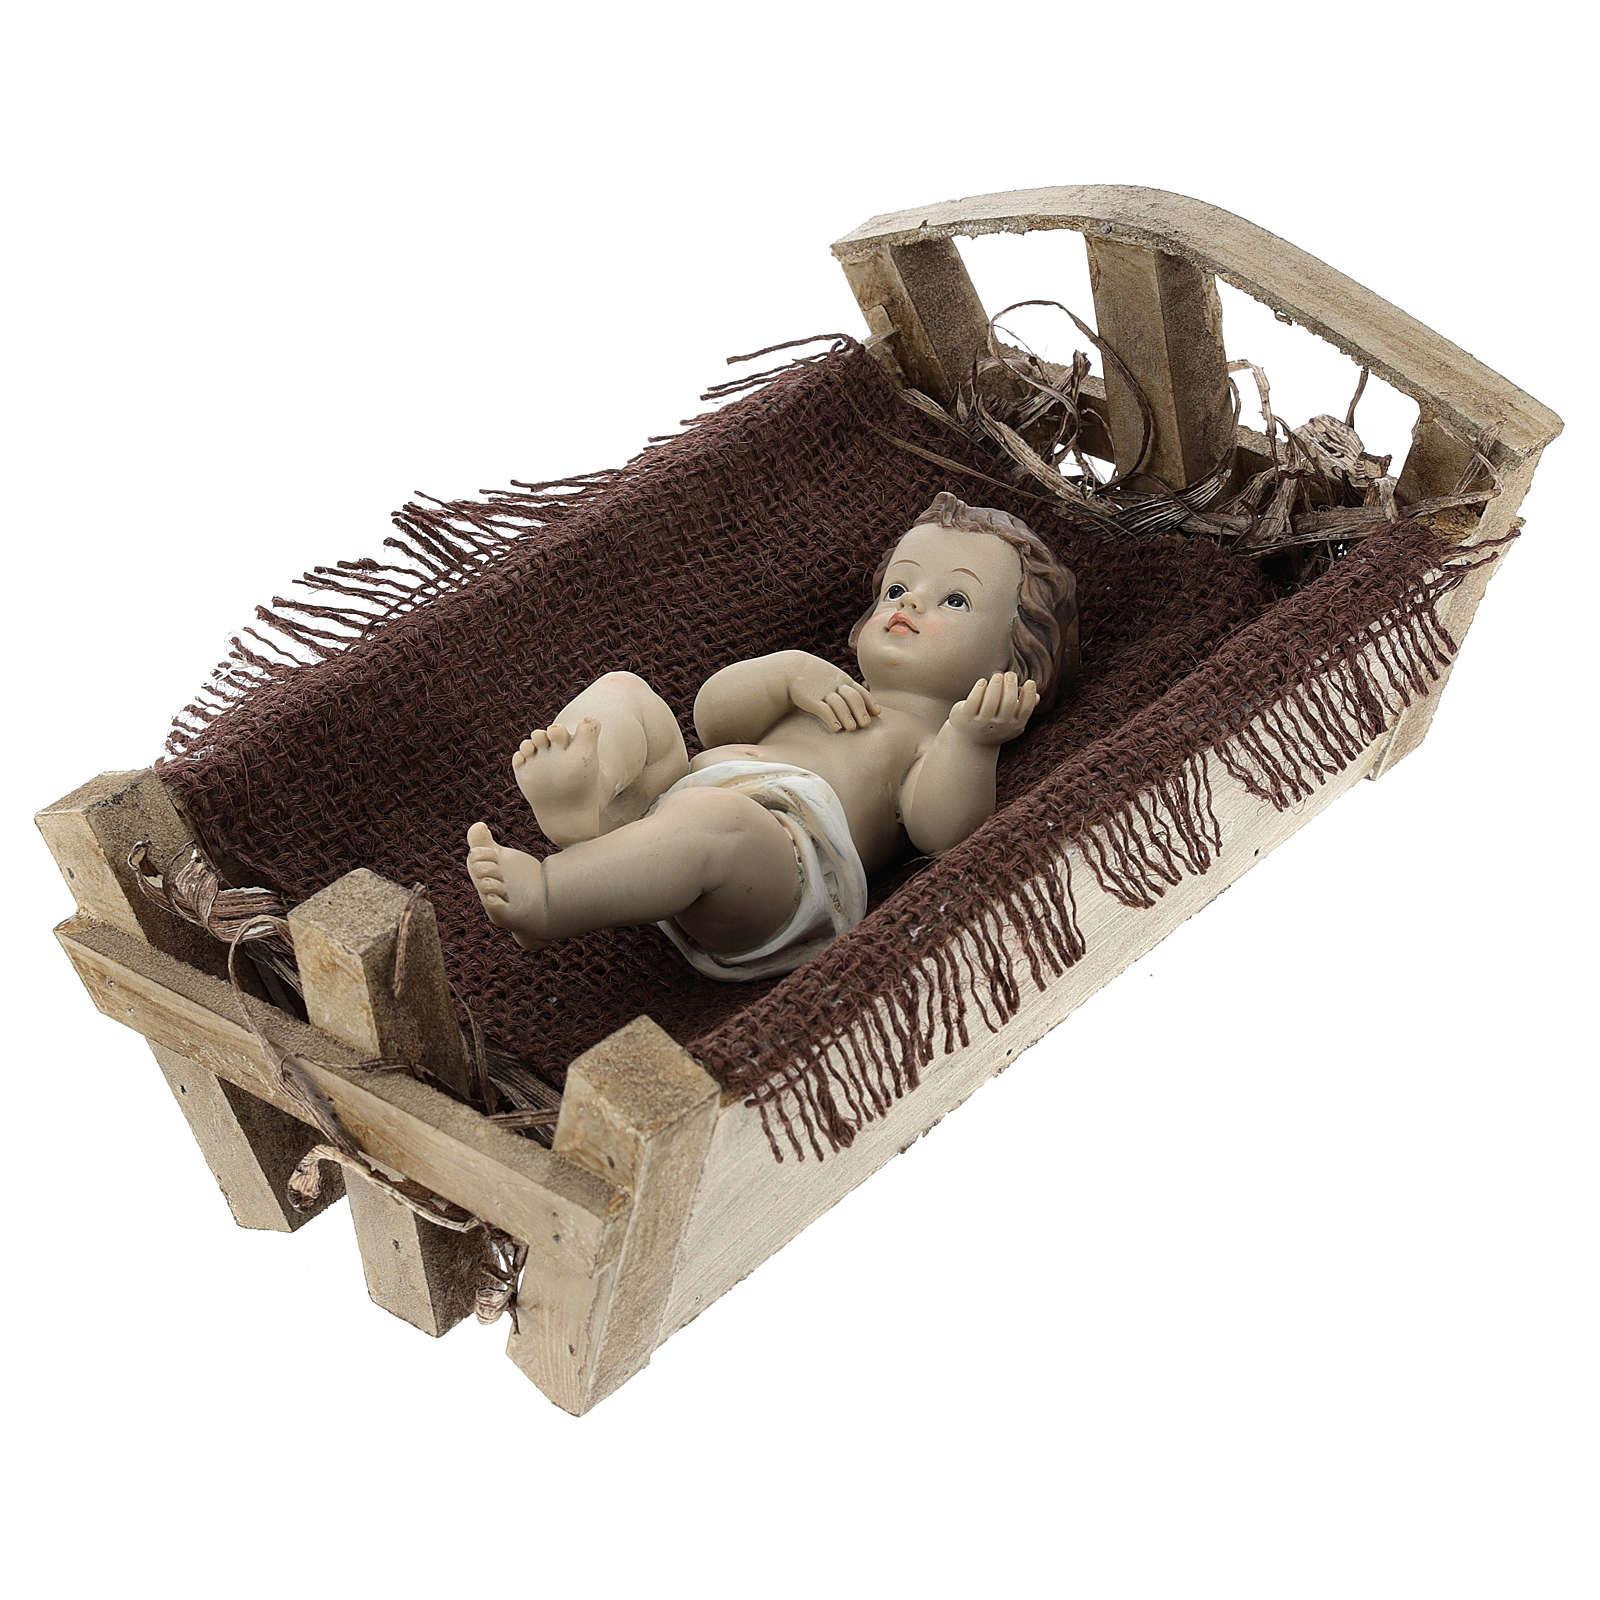 Niño Jesús resina con cuna madera 25 cm (altura real) 3